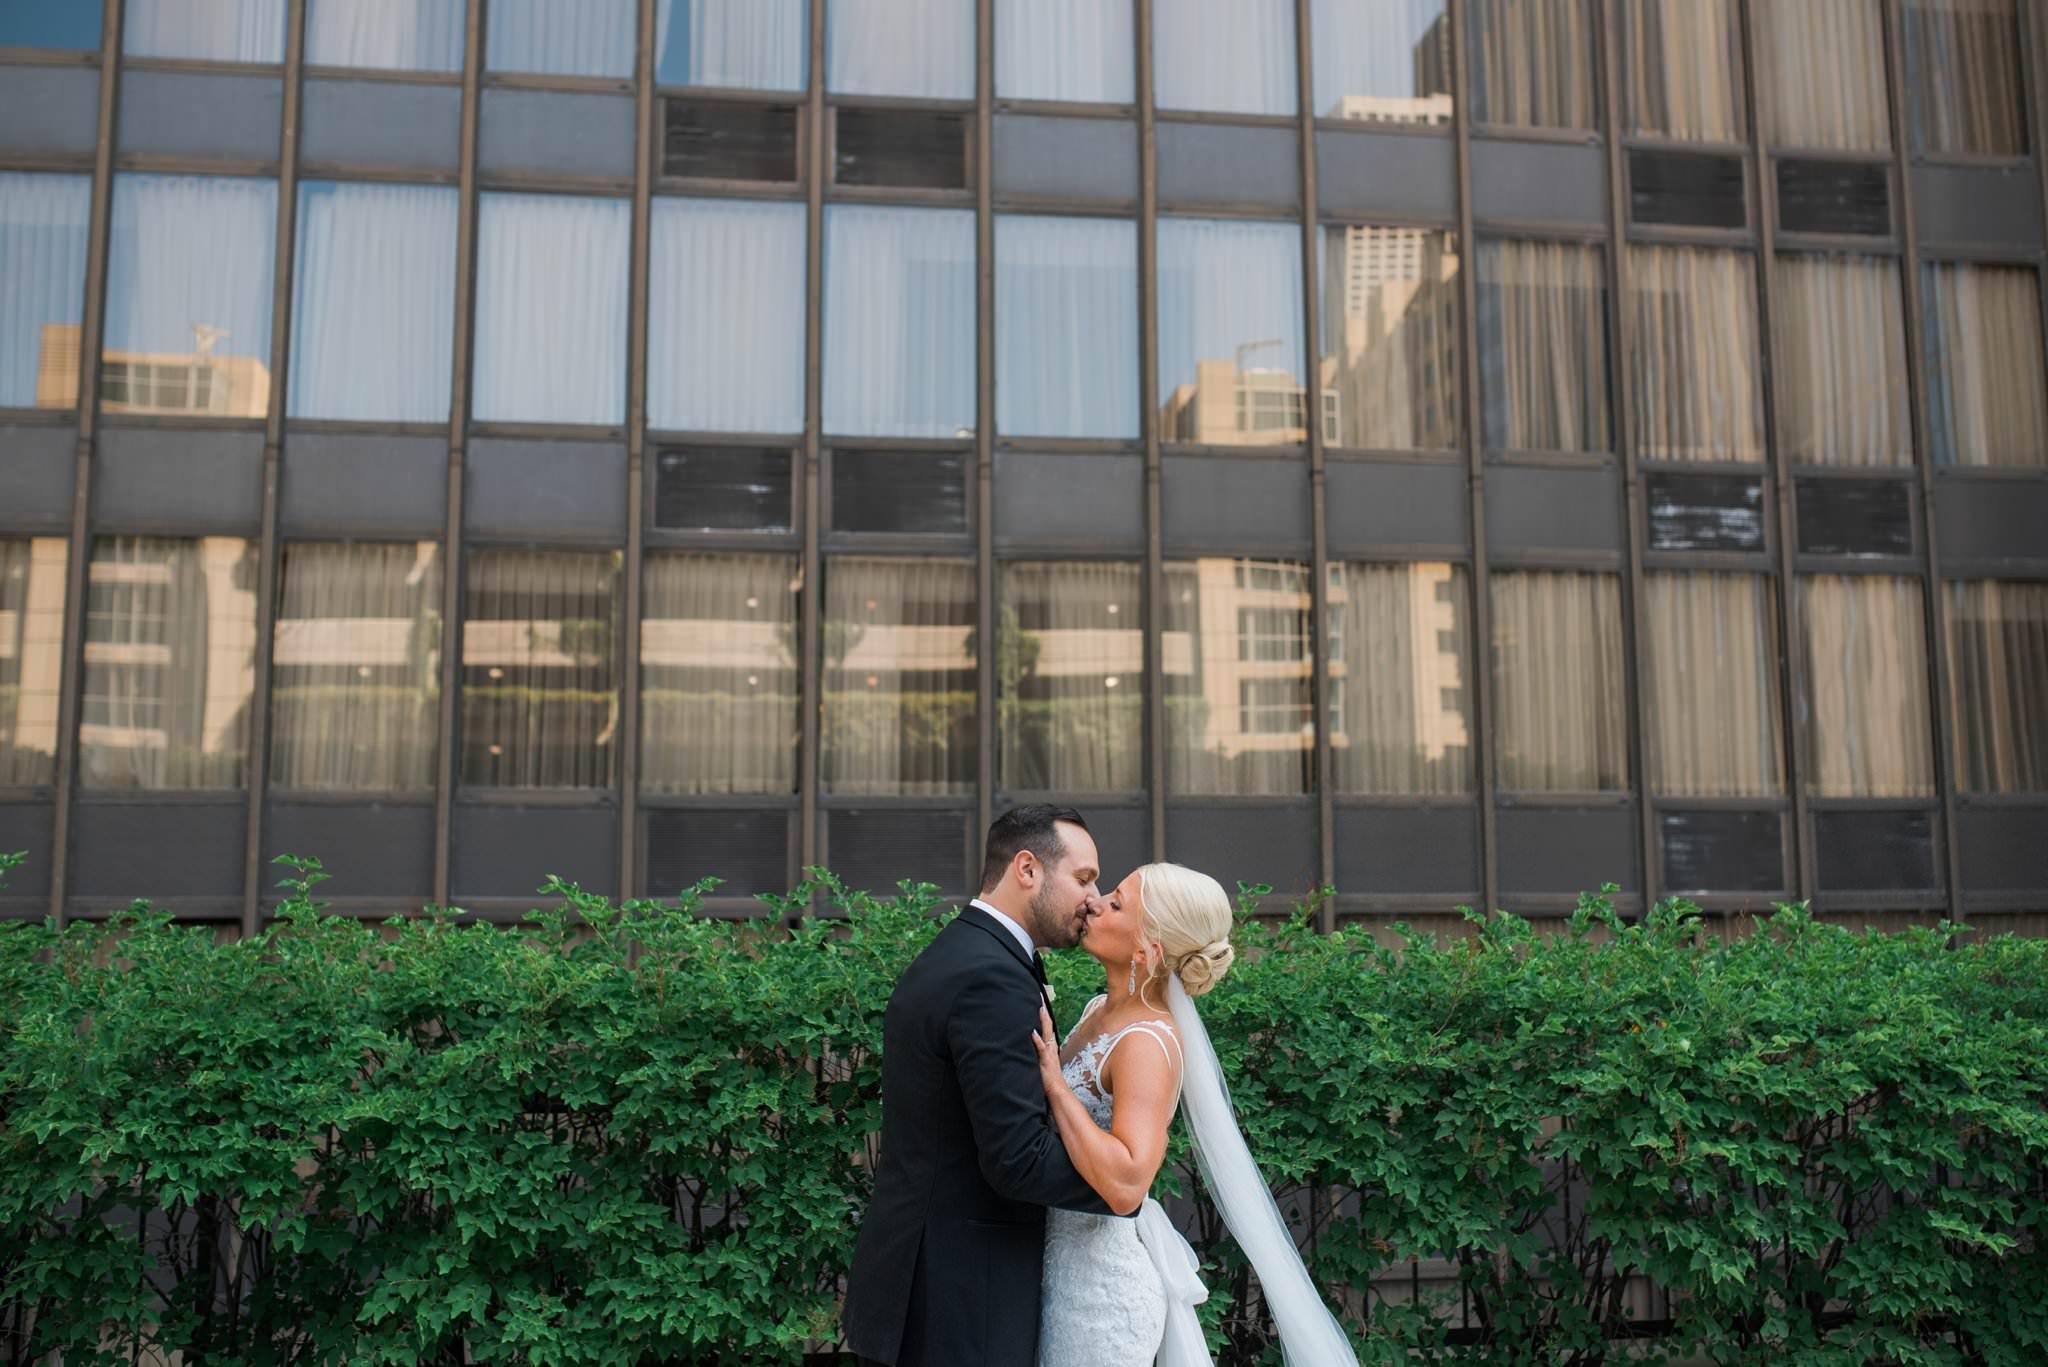 Adler-Planetarium-Chicago-Wedding-Photography-0022.JPG